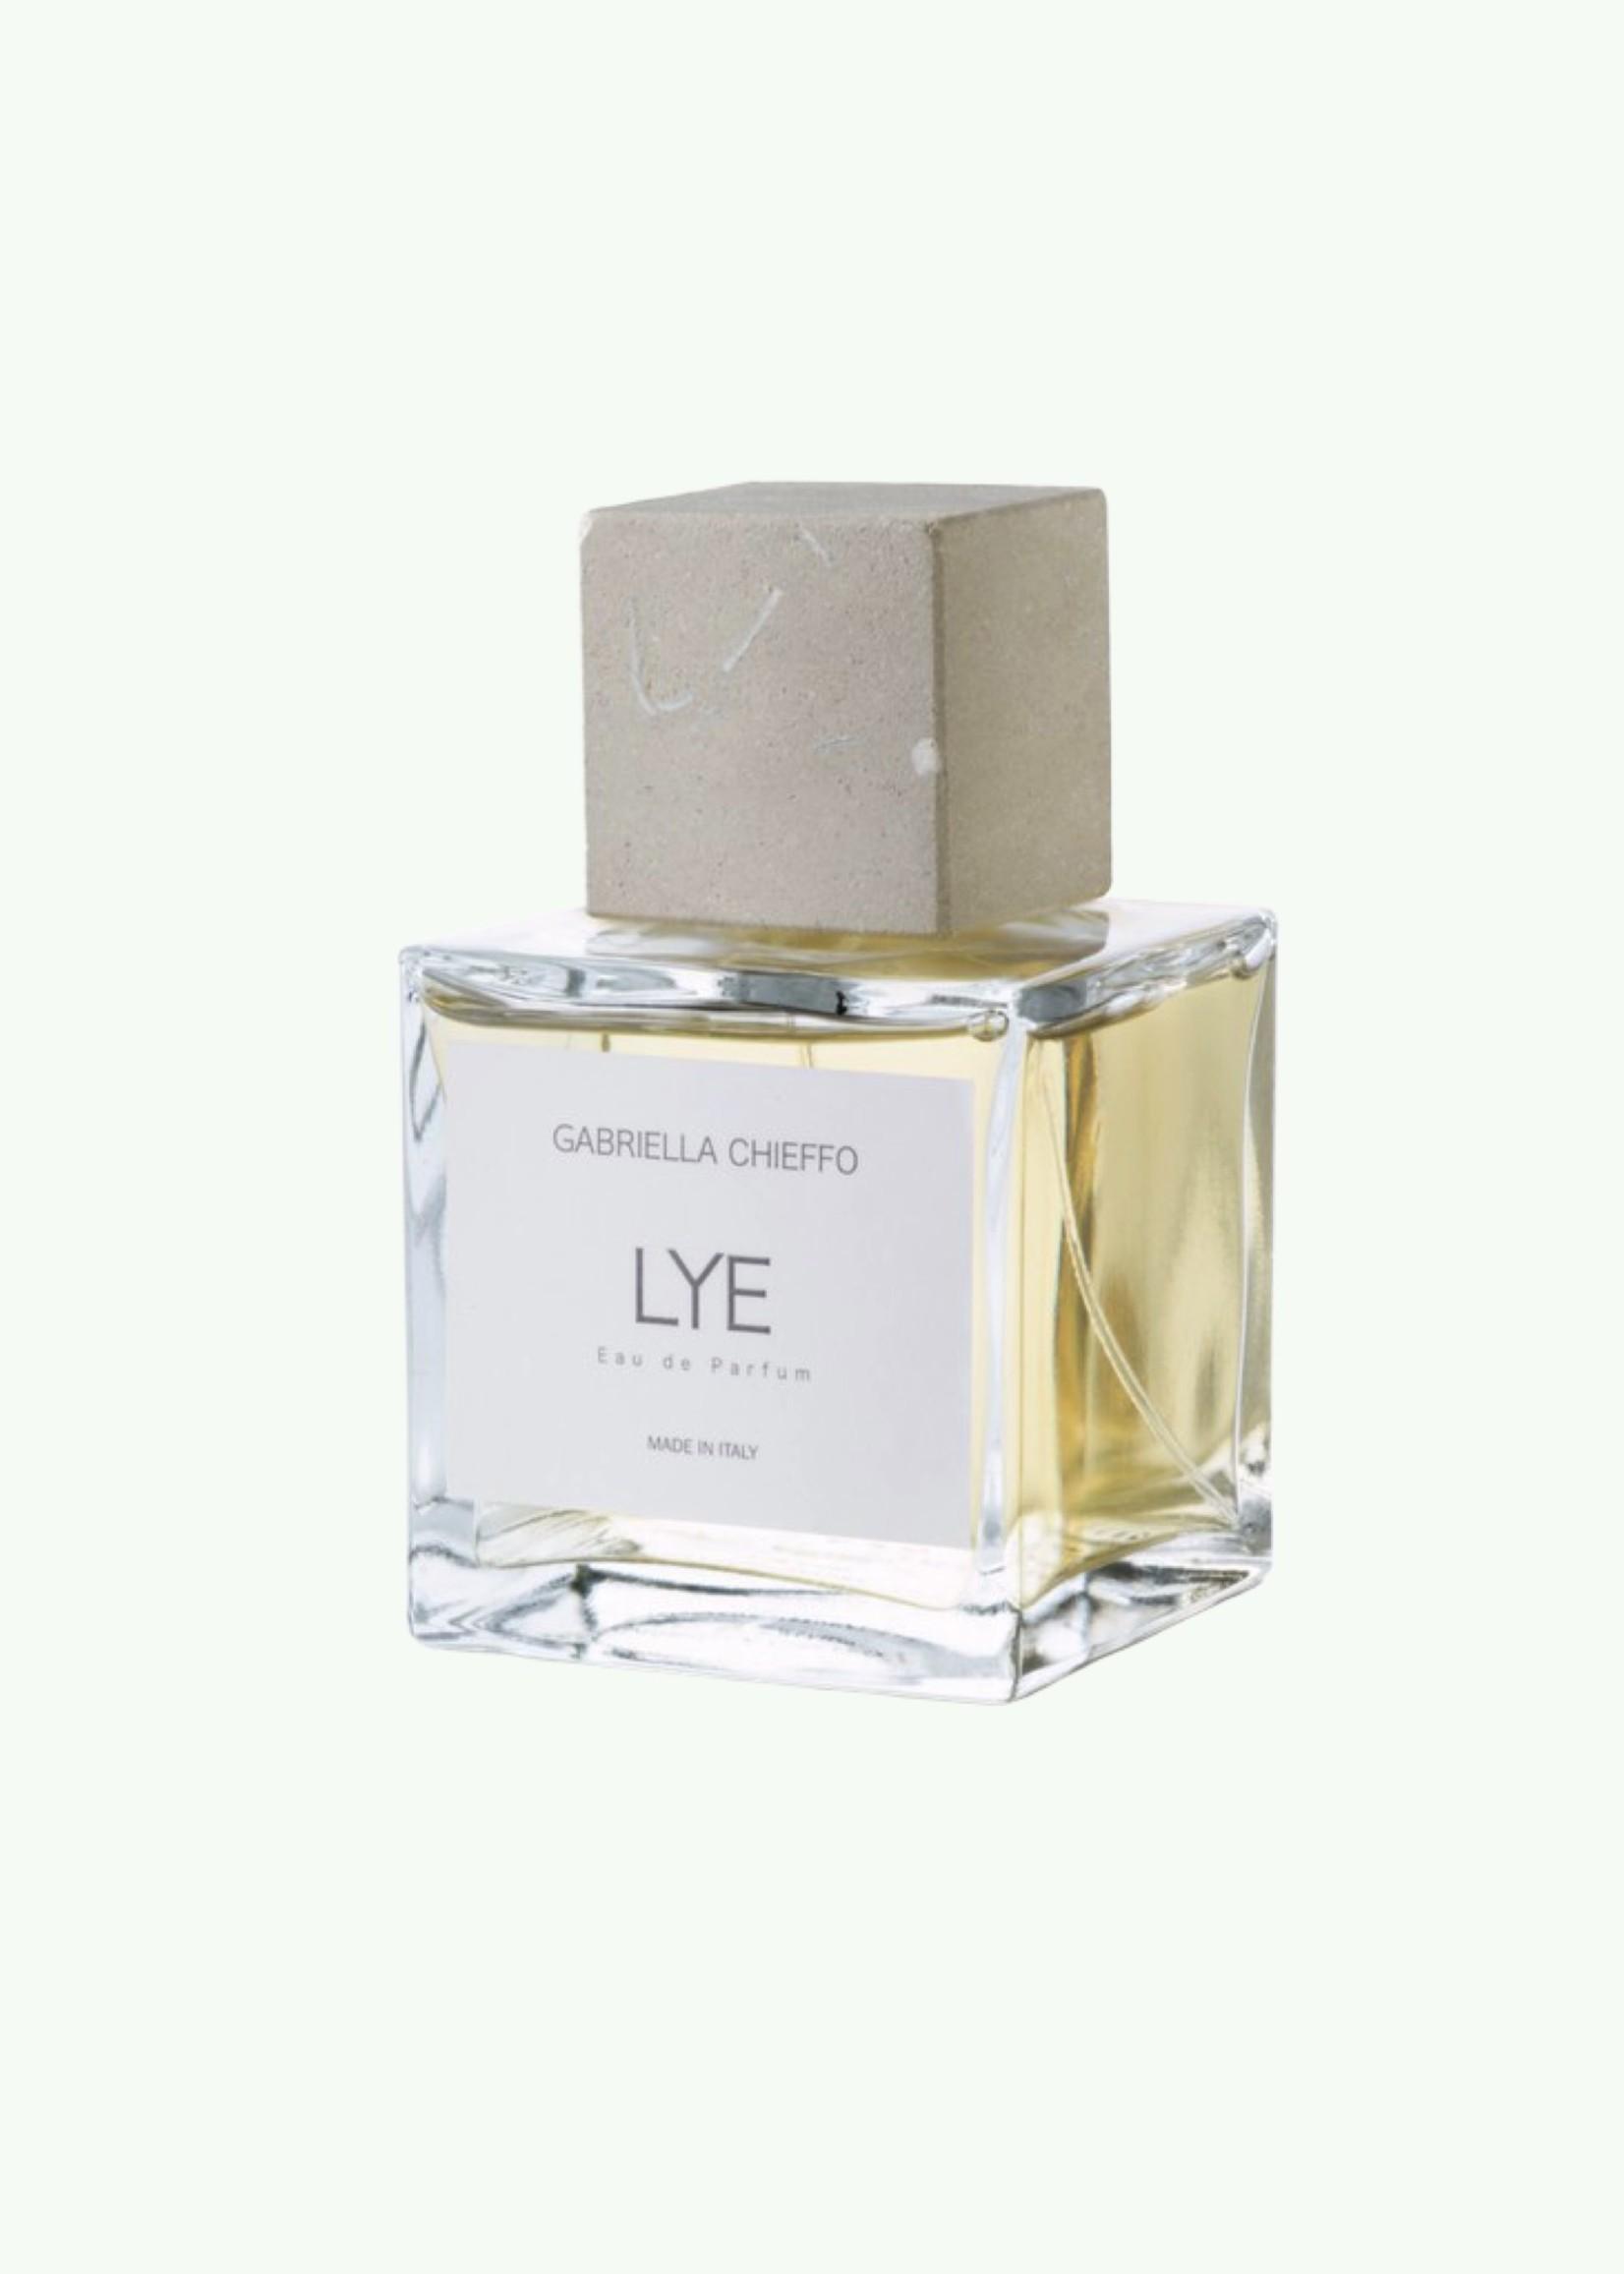 Gabriella Chieffo Gabriella Chieffo - Lye - Eau de Parfum